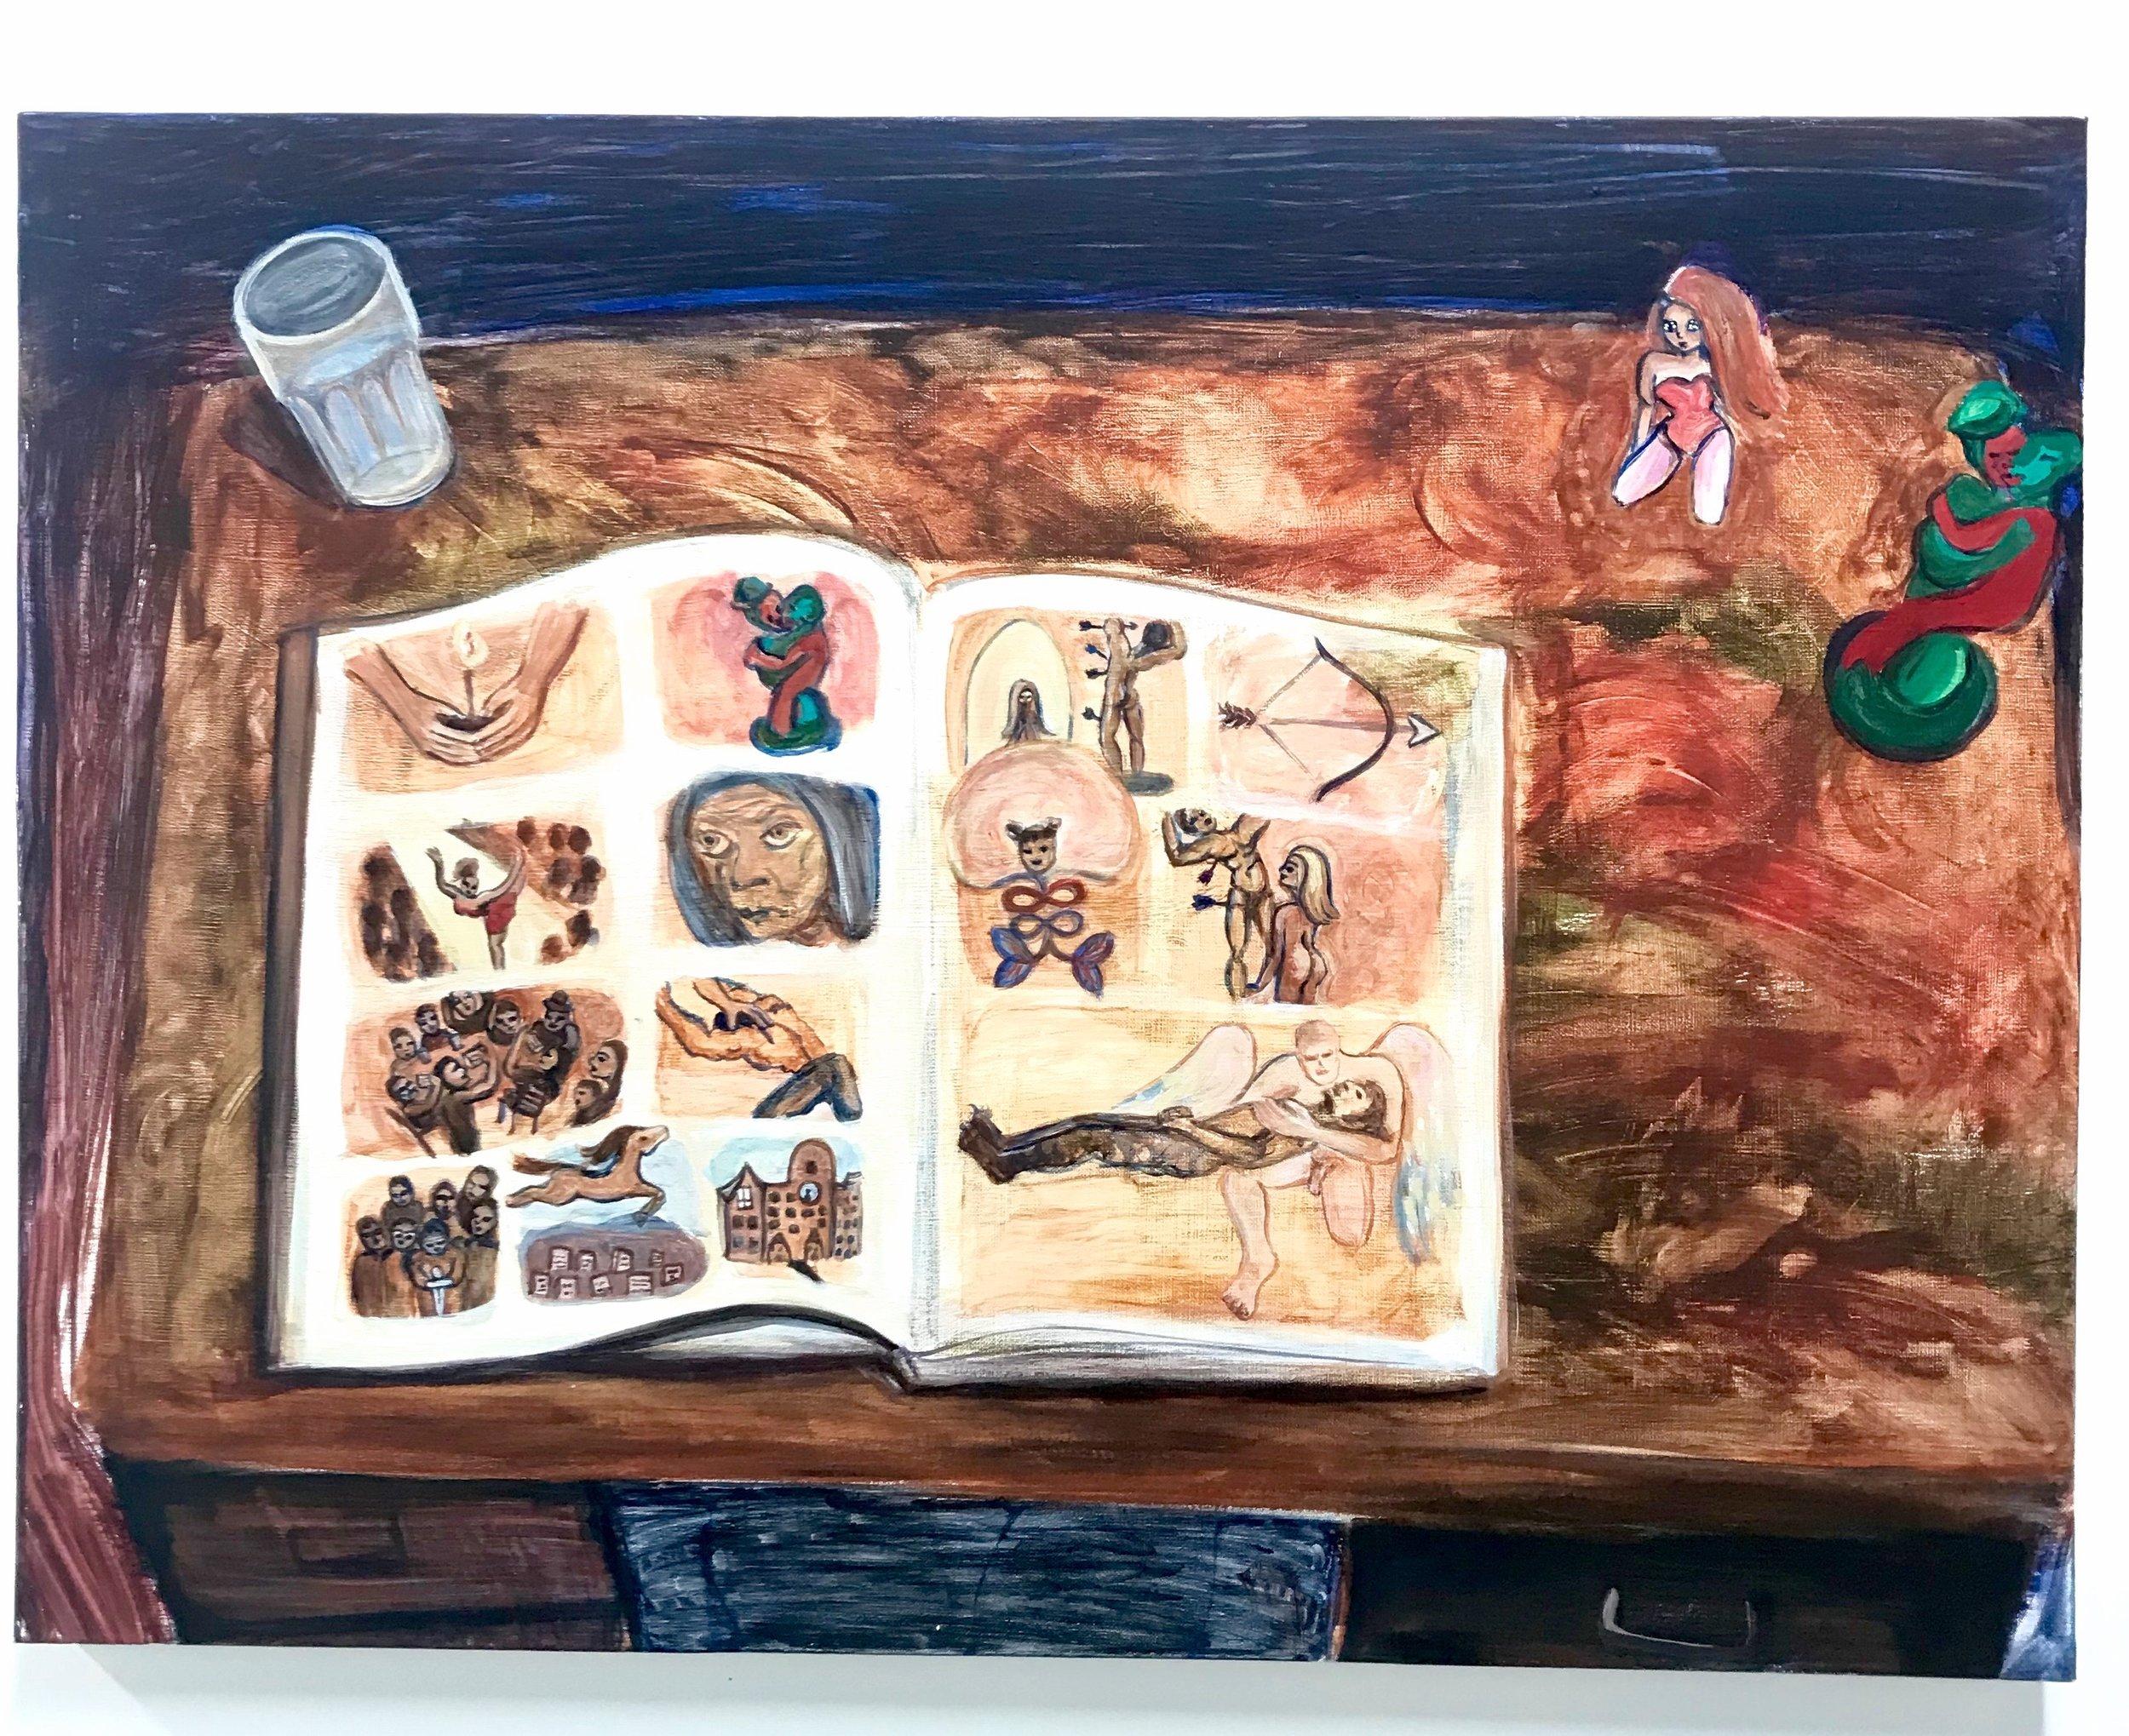 "Farrell Mason-Brown /  Magic Book /  2018-2019 / Acrylic on canvas / 30 x 40"" /  farrell.portfoliobox.net"